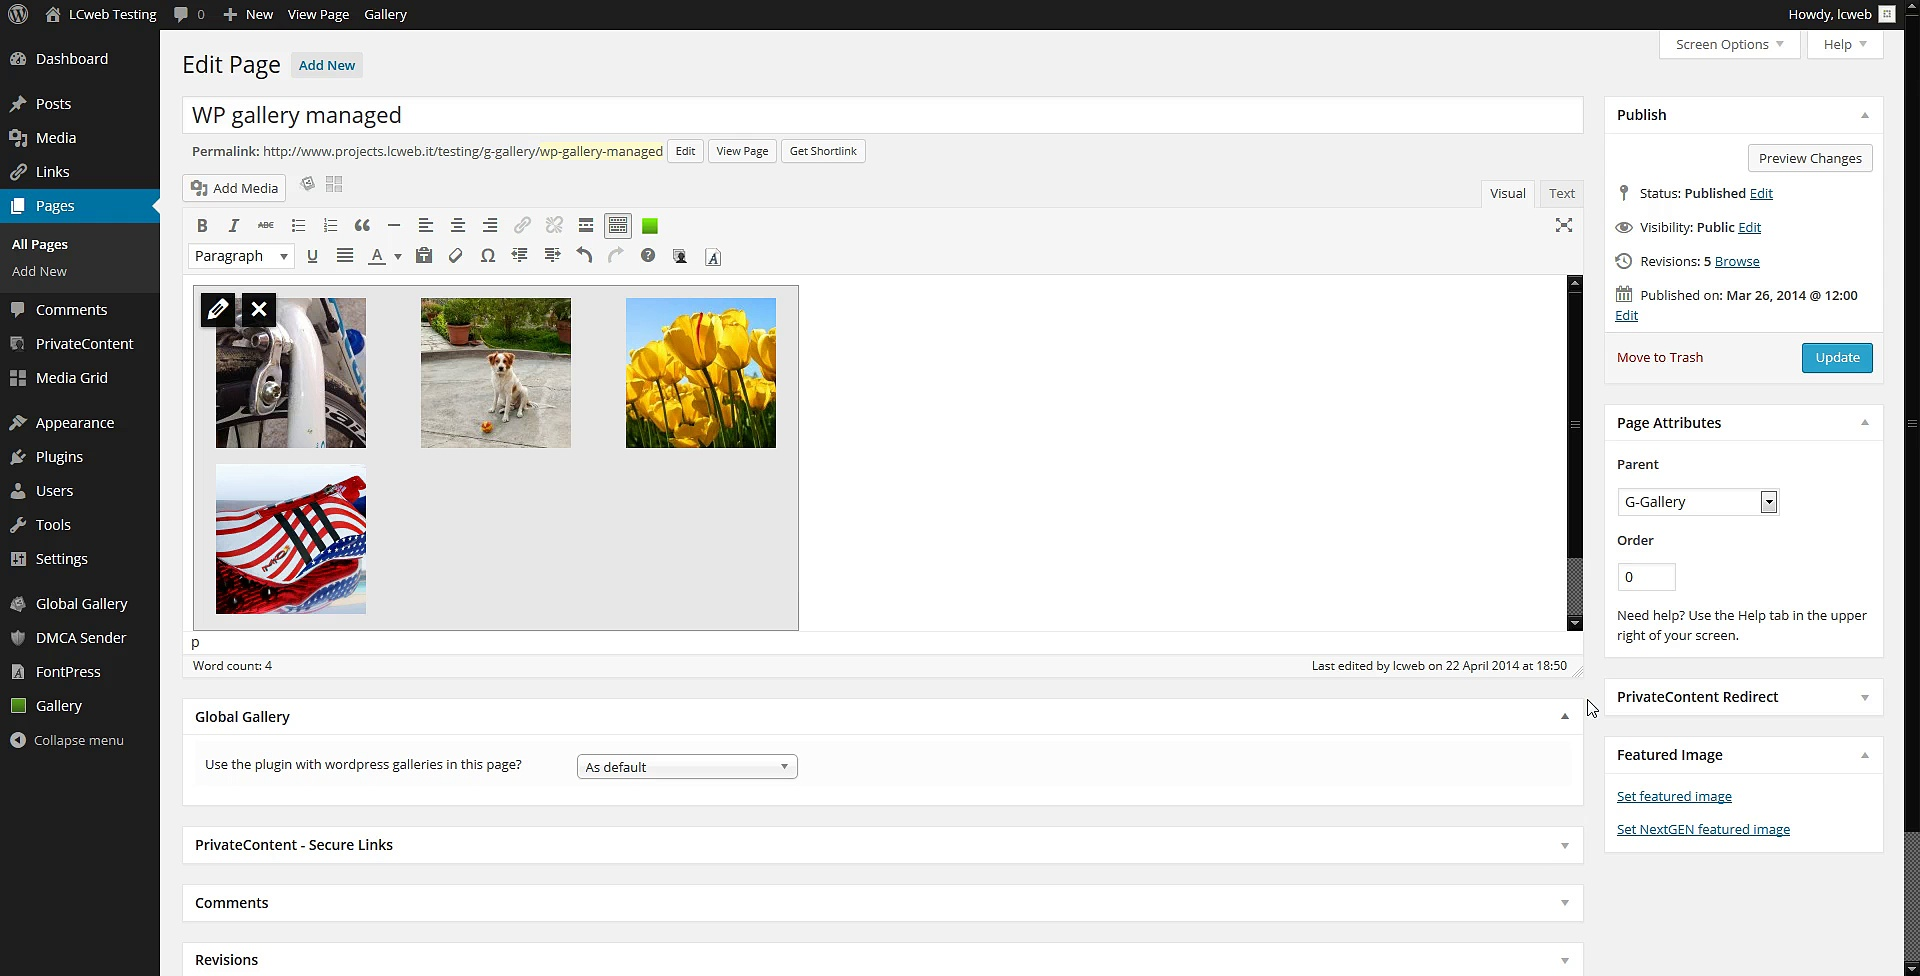 Global Gallery (10) – WordPress galleries integration